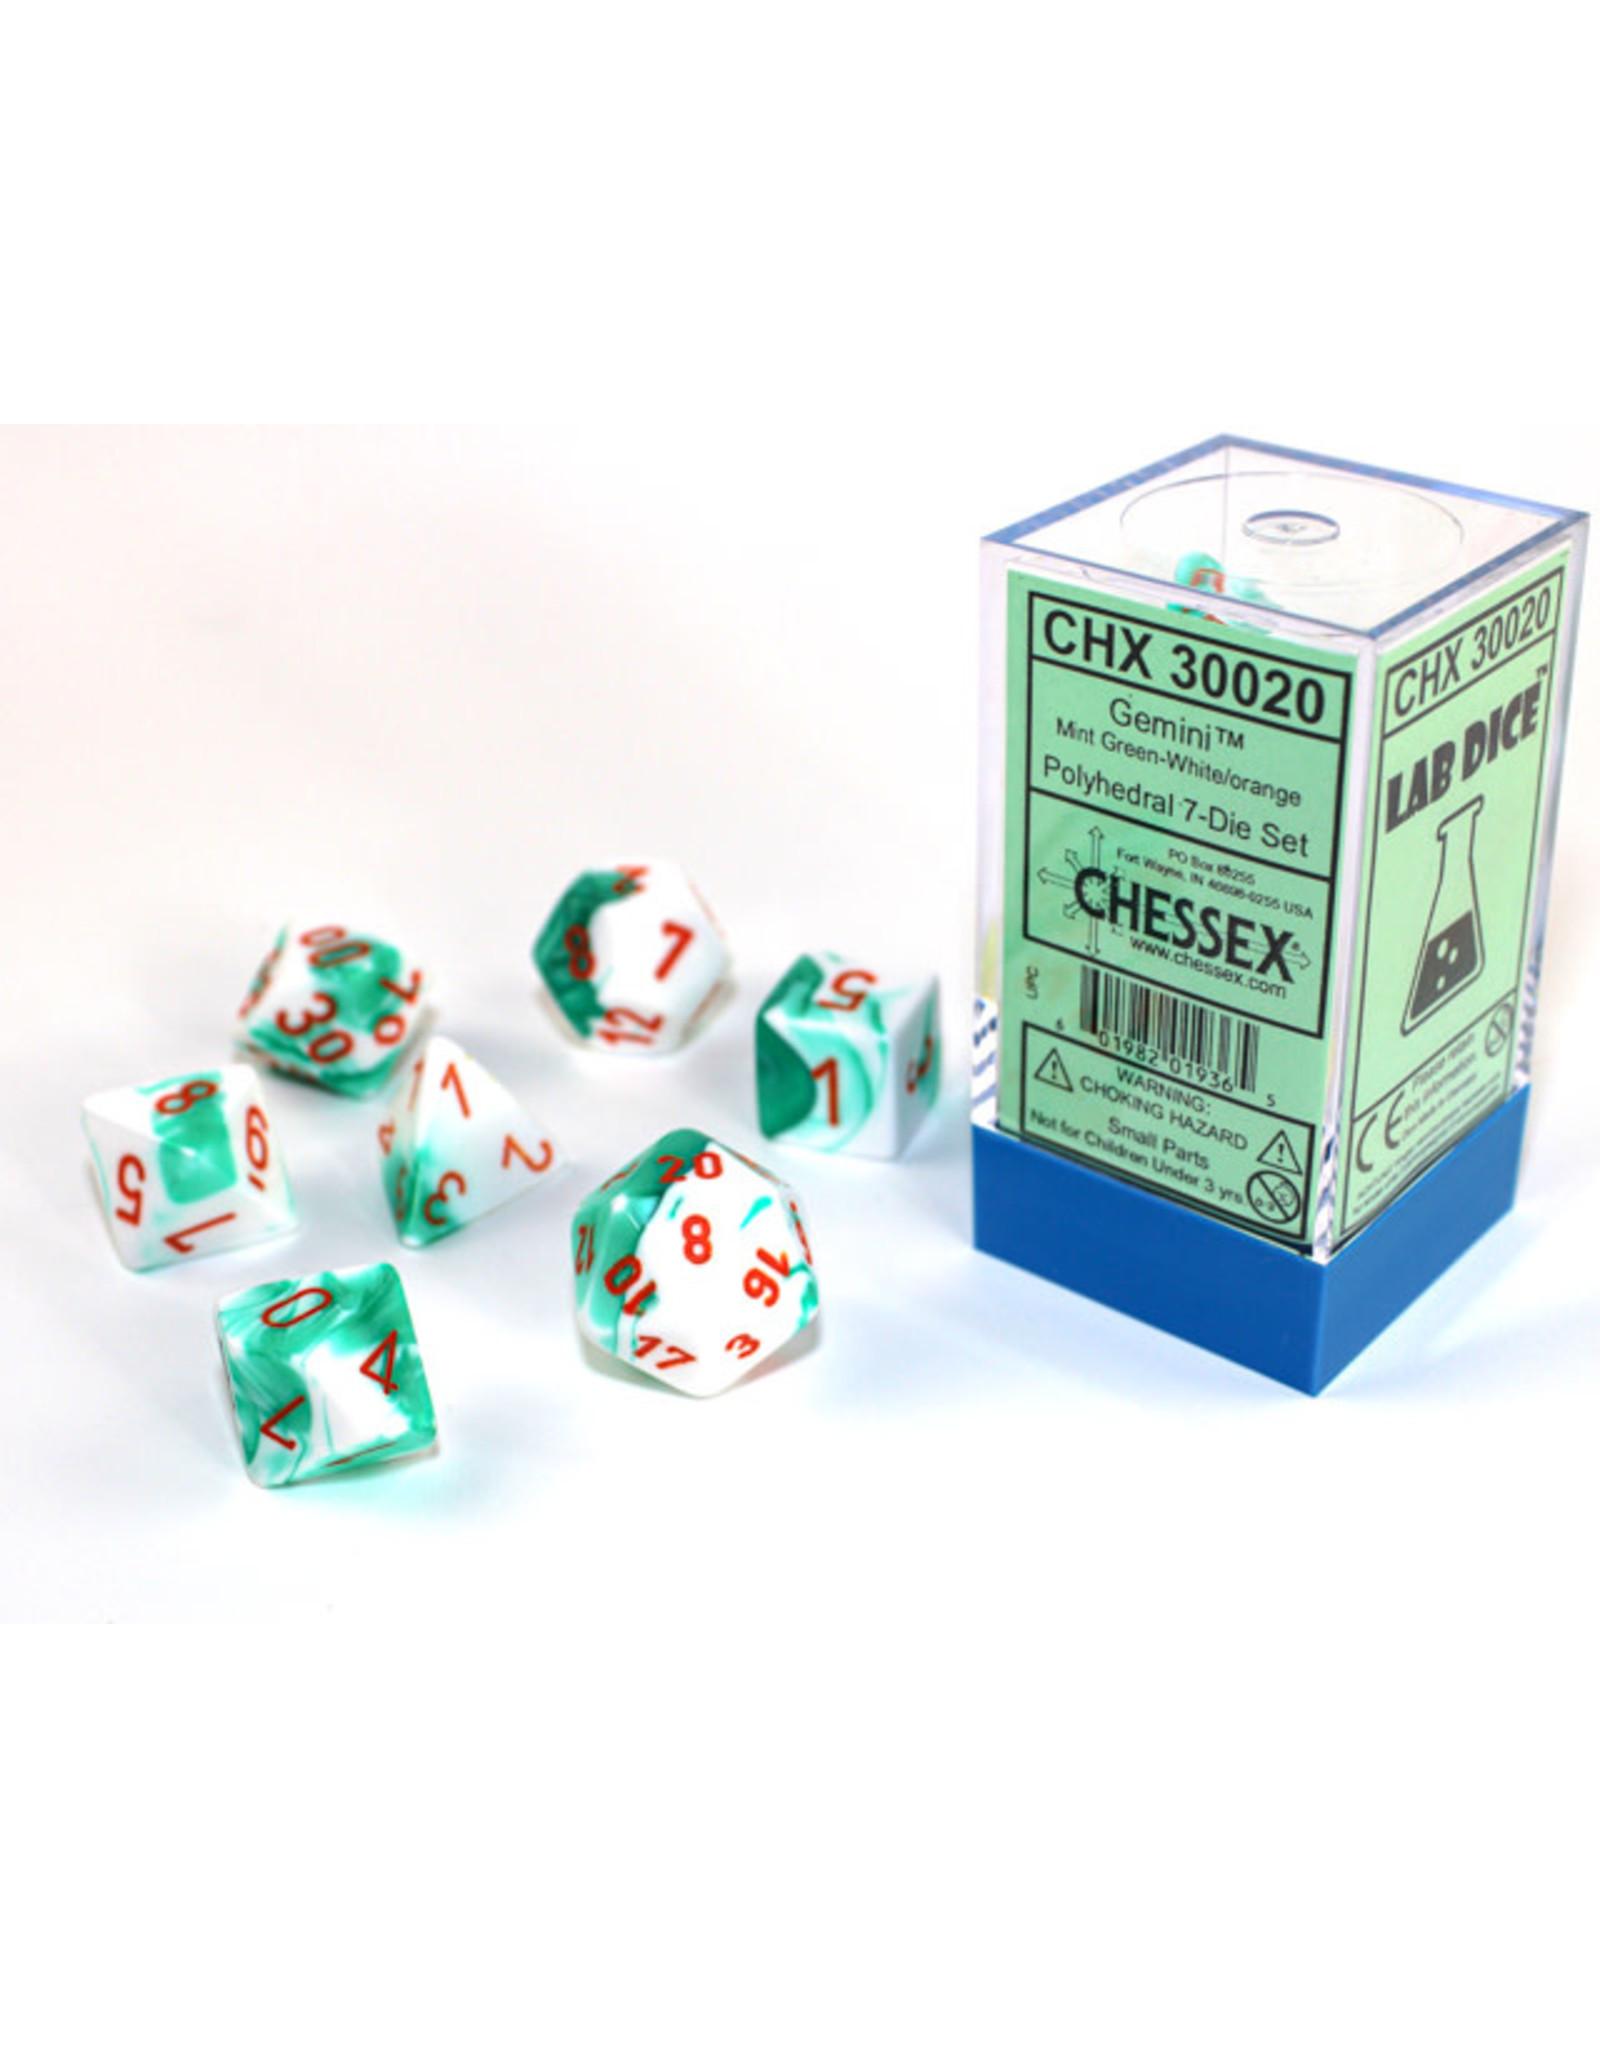 Chessex Chessex: 7-Die Set Gemini: Mint Green-White/Orange